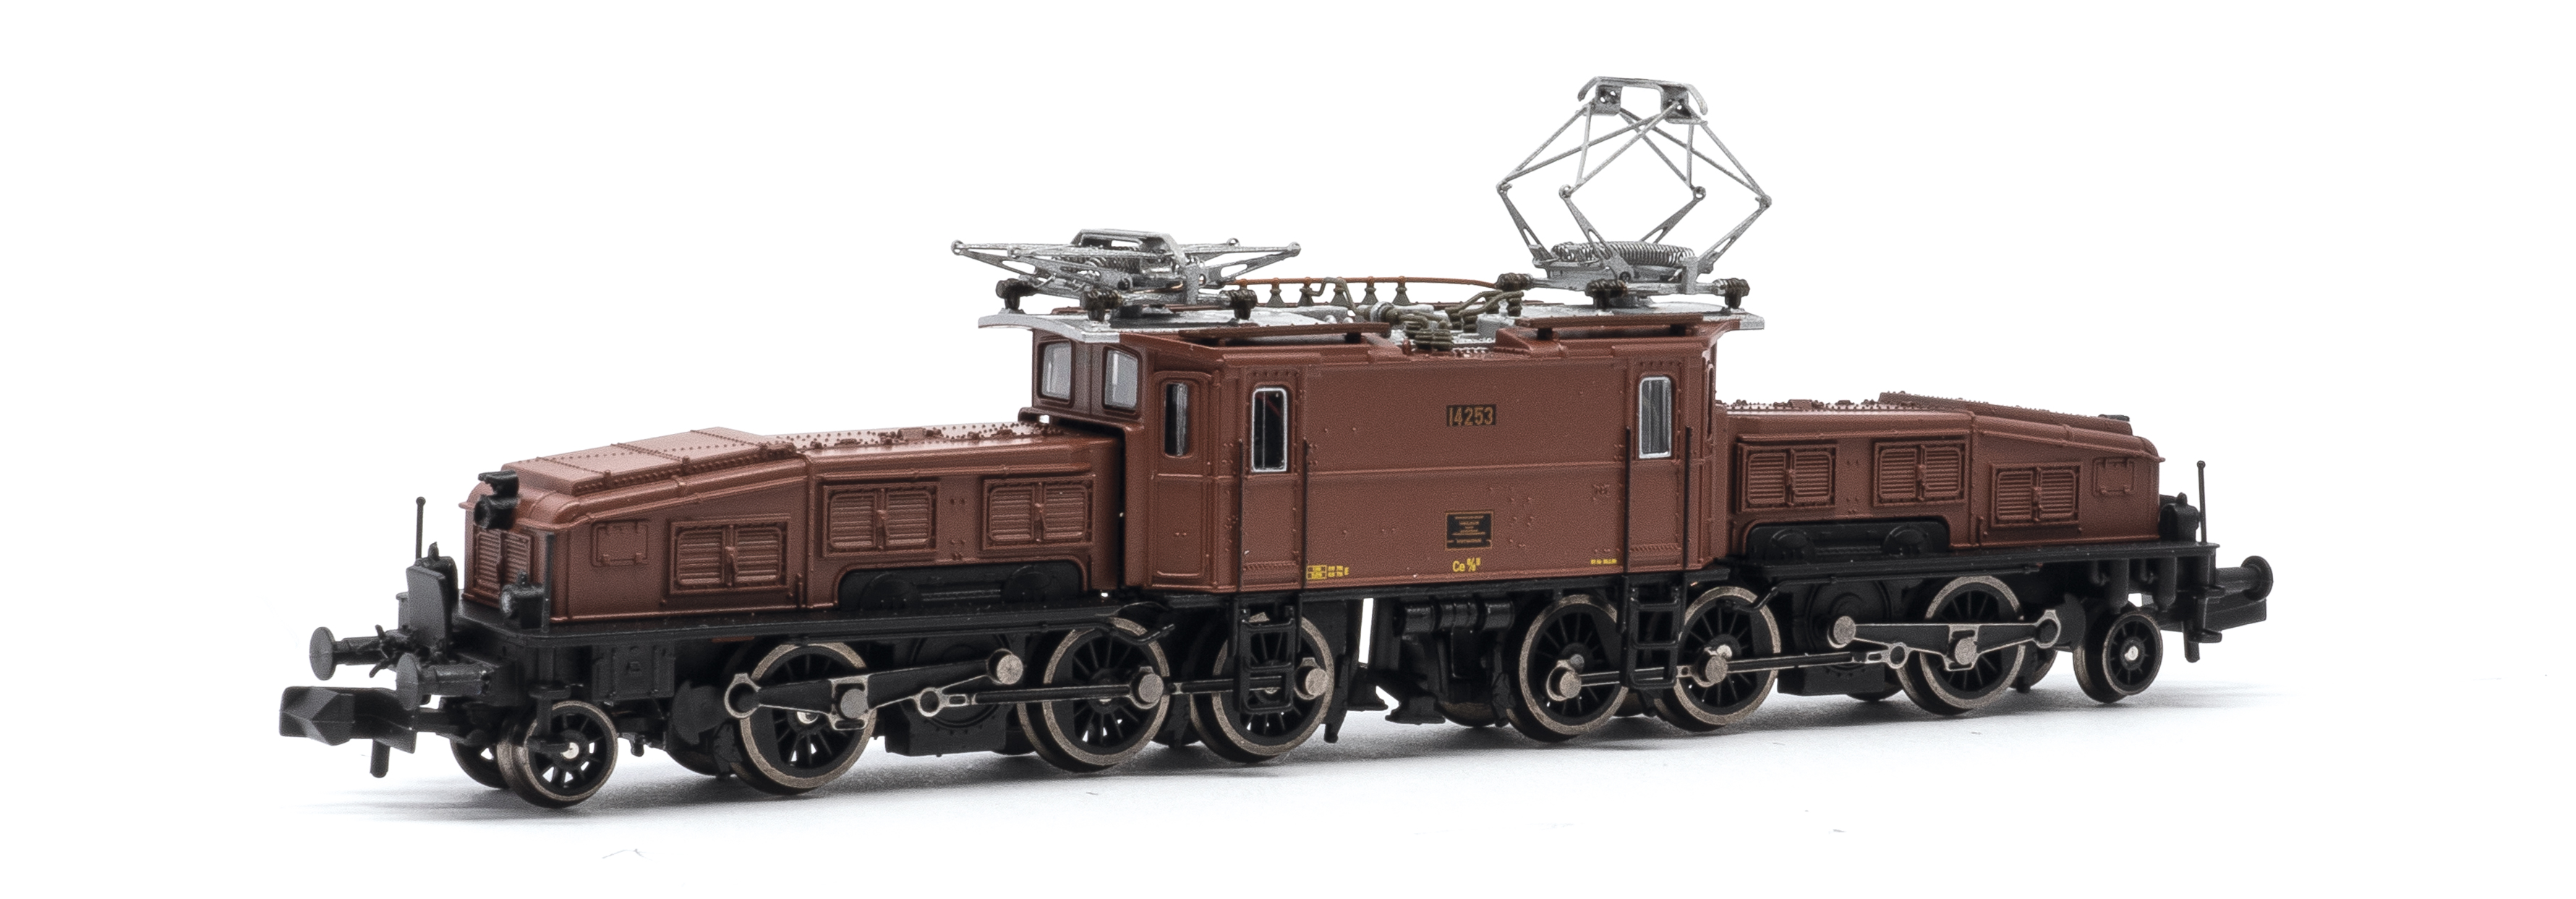 JC62130